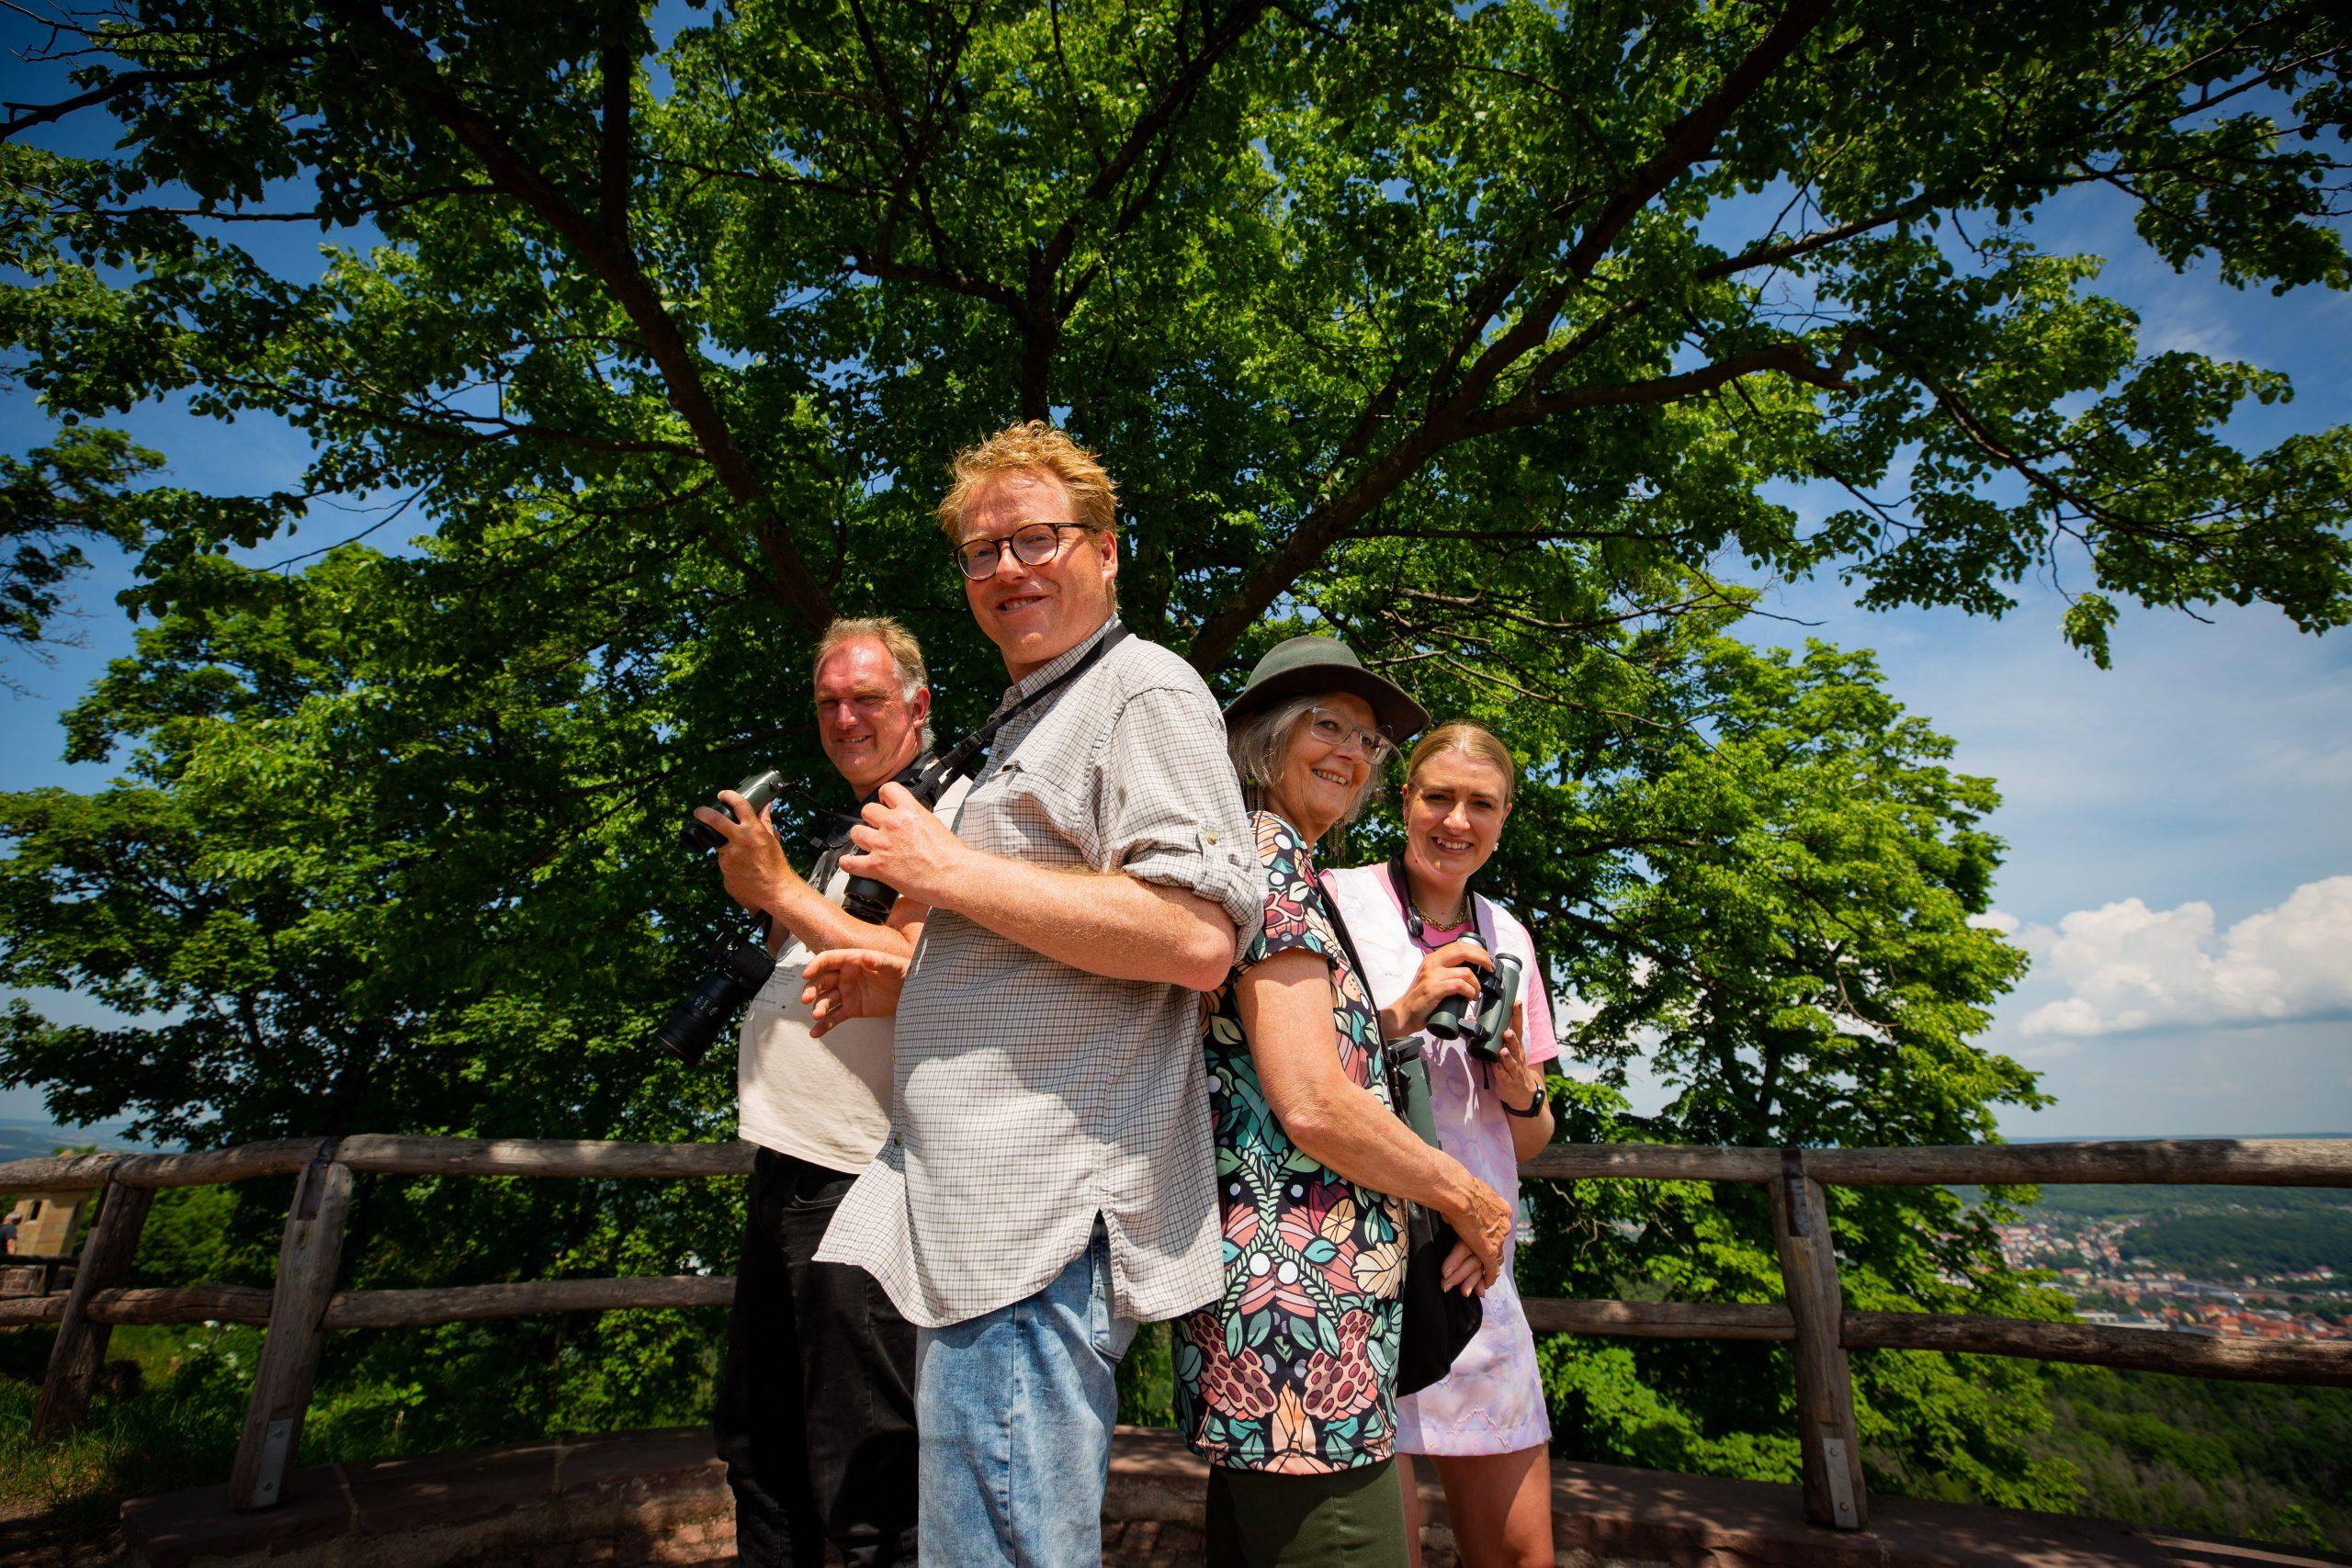 Kvartetten i TV 2-programmet fotograferet i Tyskland. Pressefoto via Tysk Turist Information: Made by us, fotograf Victor Grønbech.